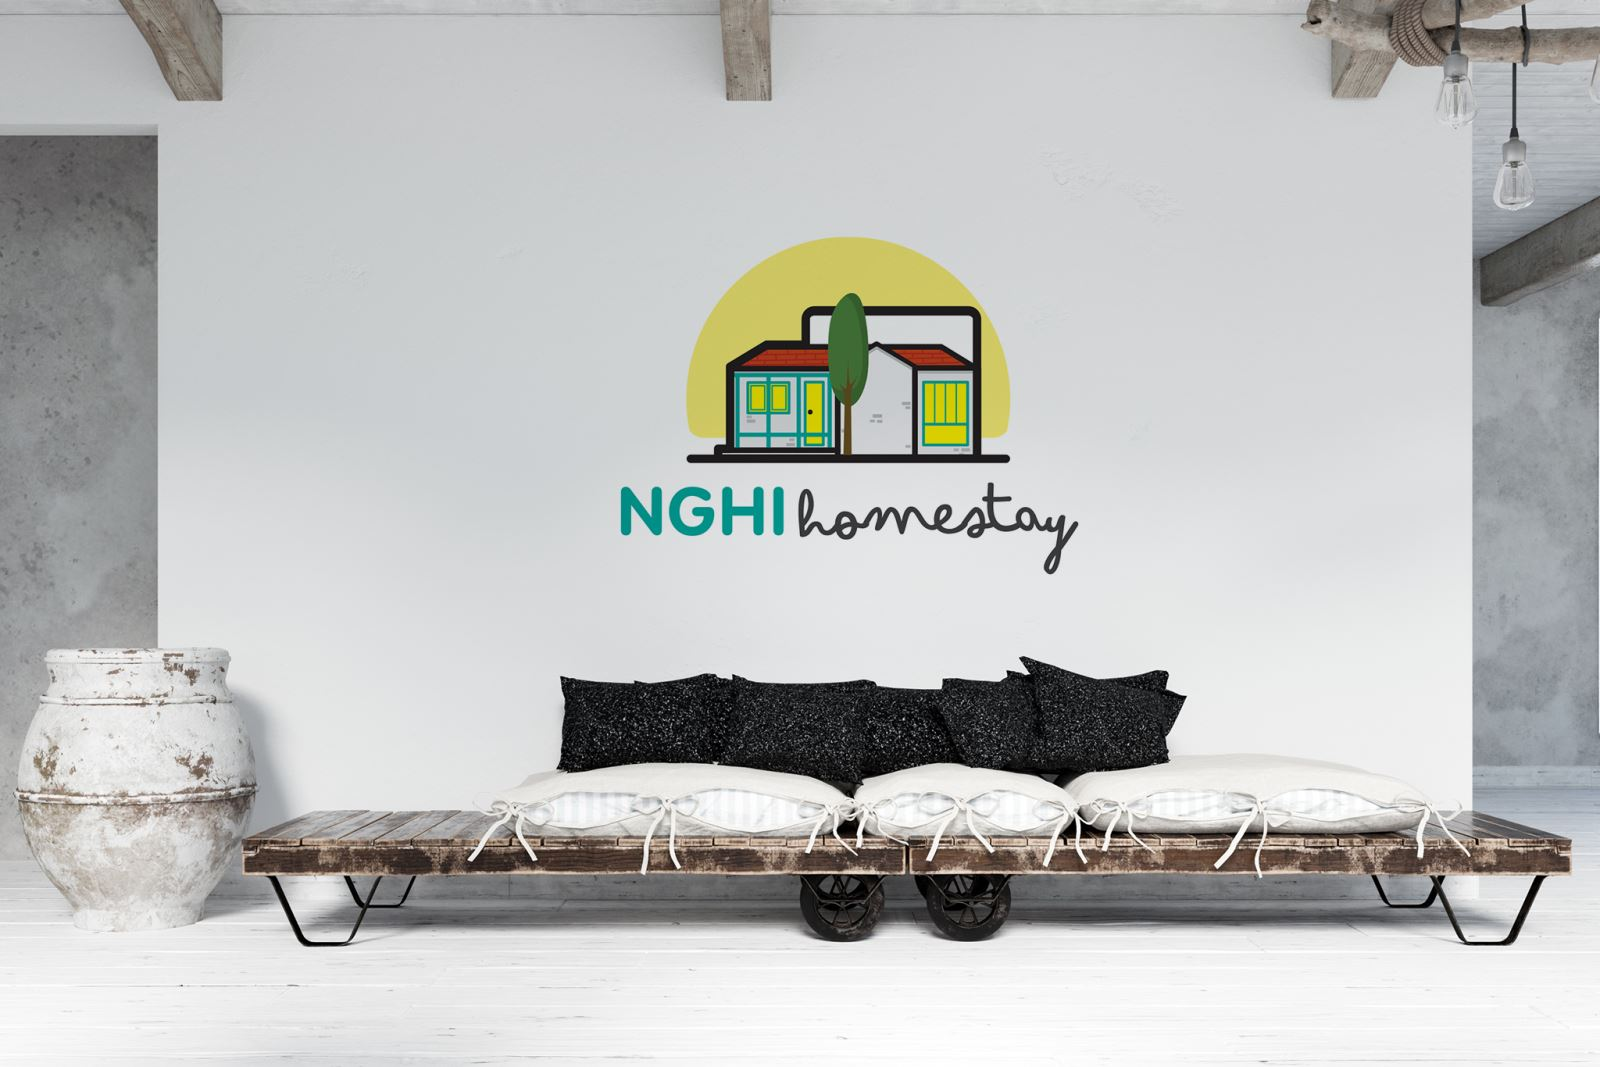 THIẾT KẾ LOGO NGHI HOMESTAY